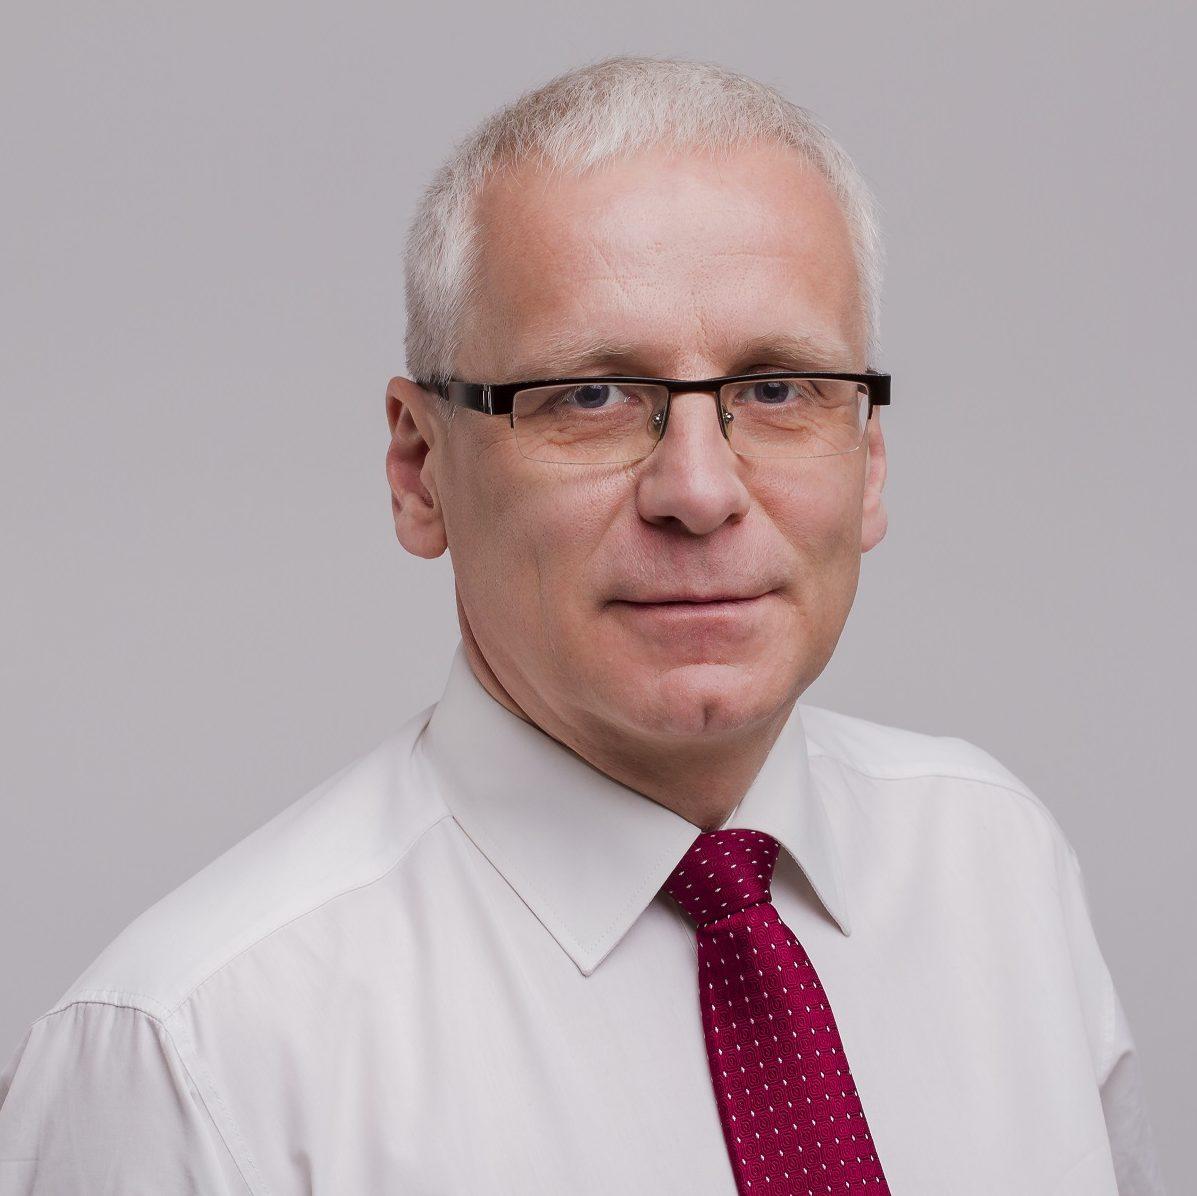 Jarosław Obremski